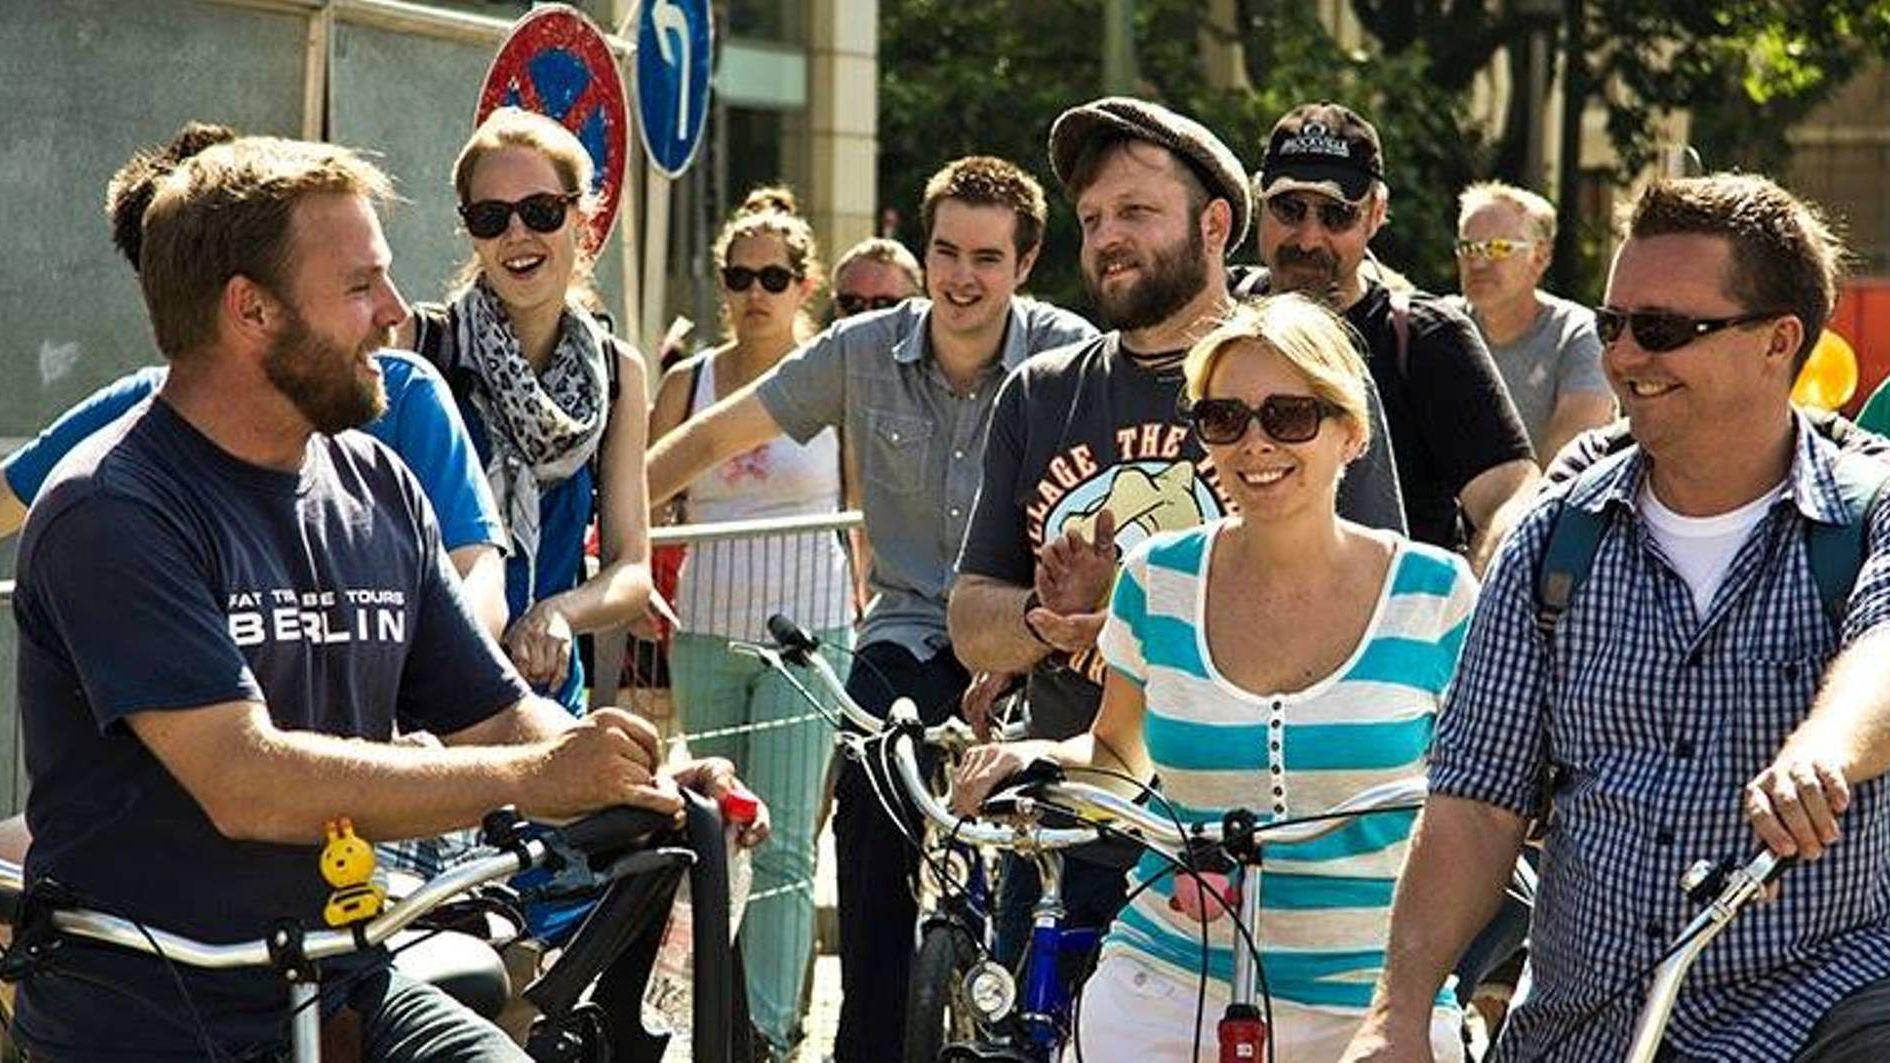 Bike tour group in Berlin